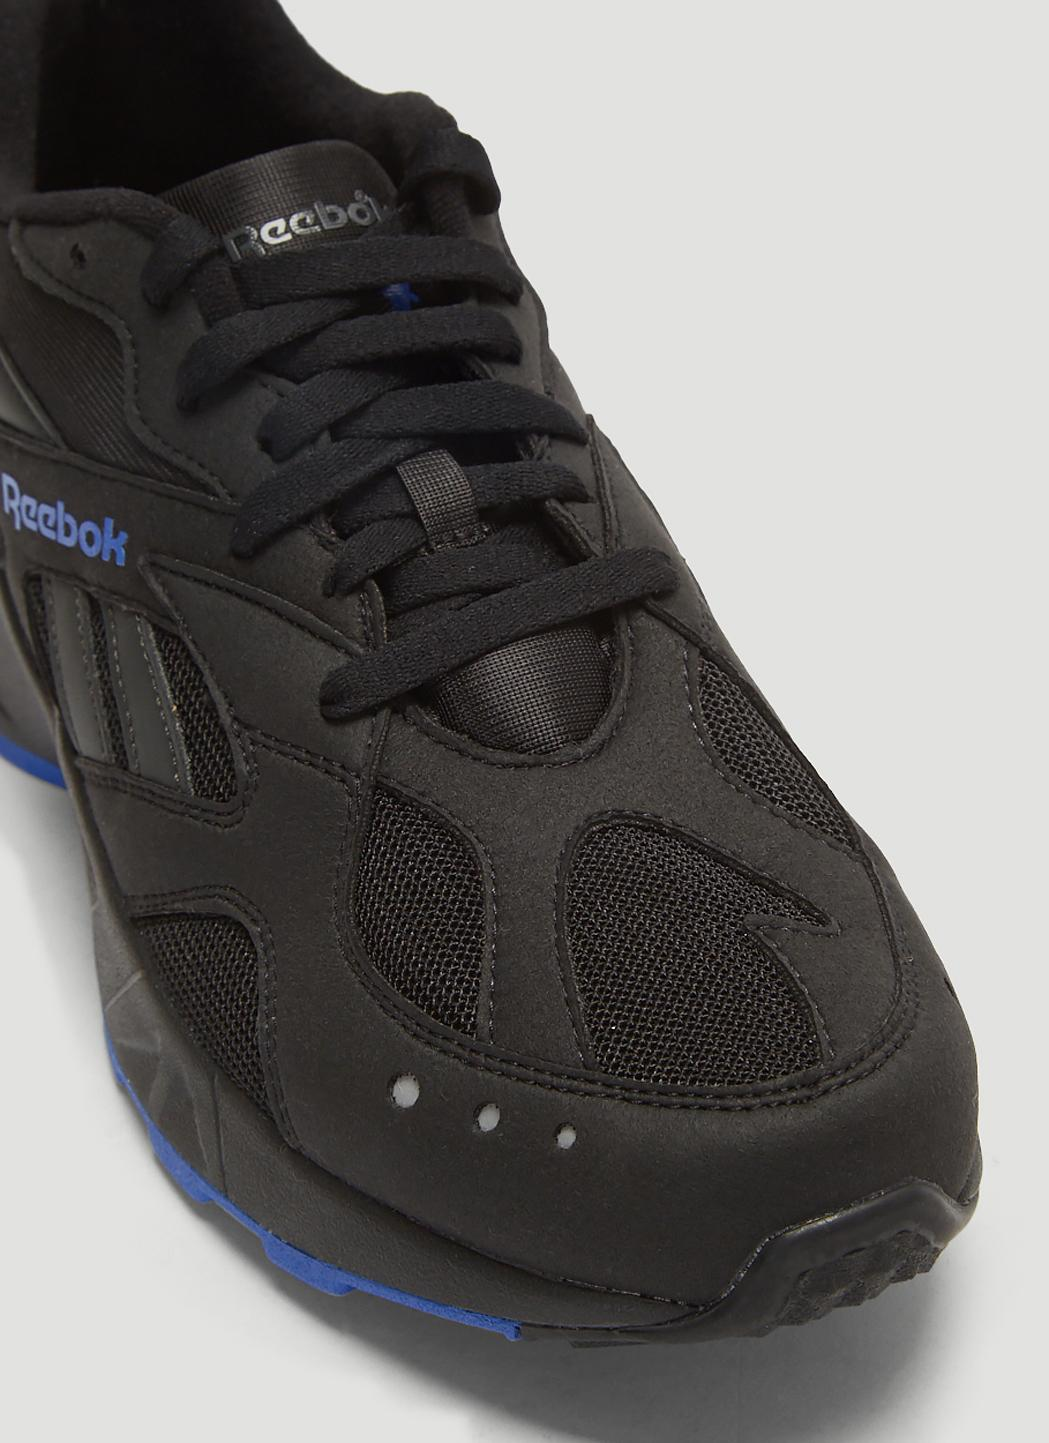 2beb99262 Reebok Aztrek Classic Sneakers In Black in Black for Men - Lyst